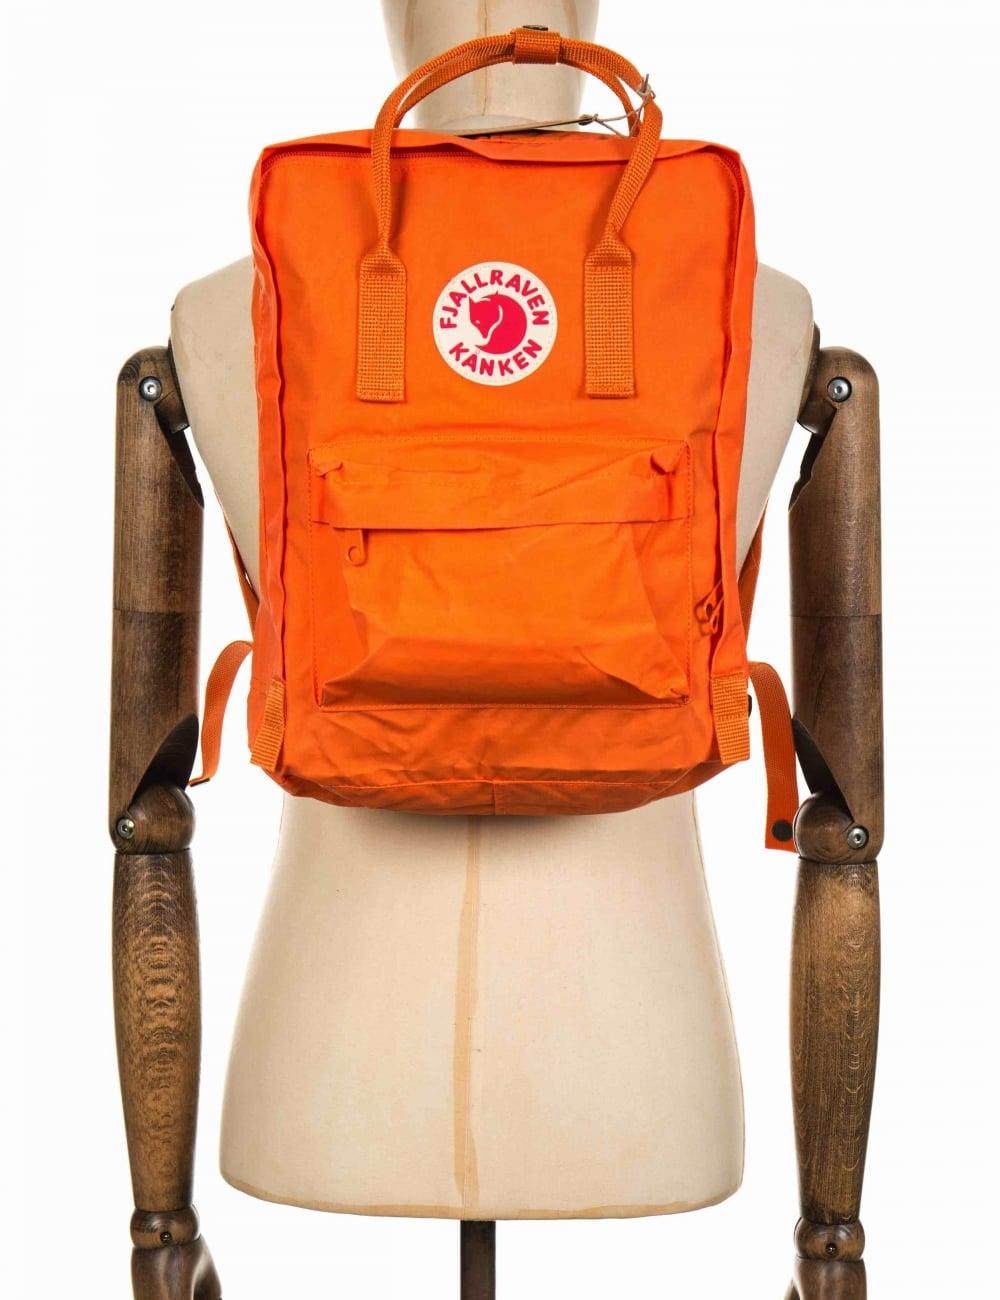 kanken rucksack burnt orange